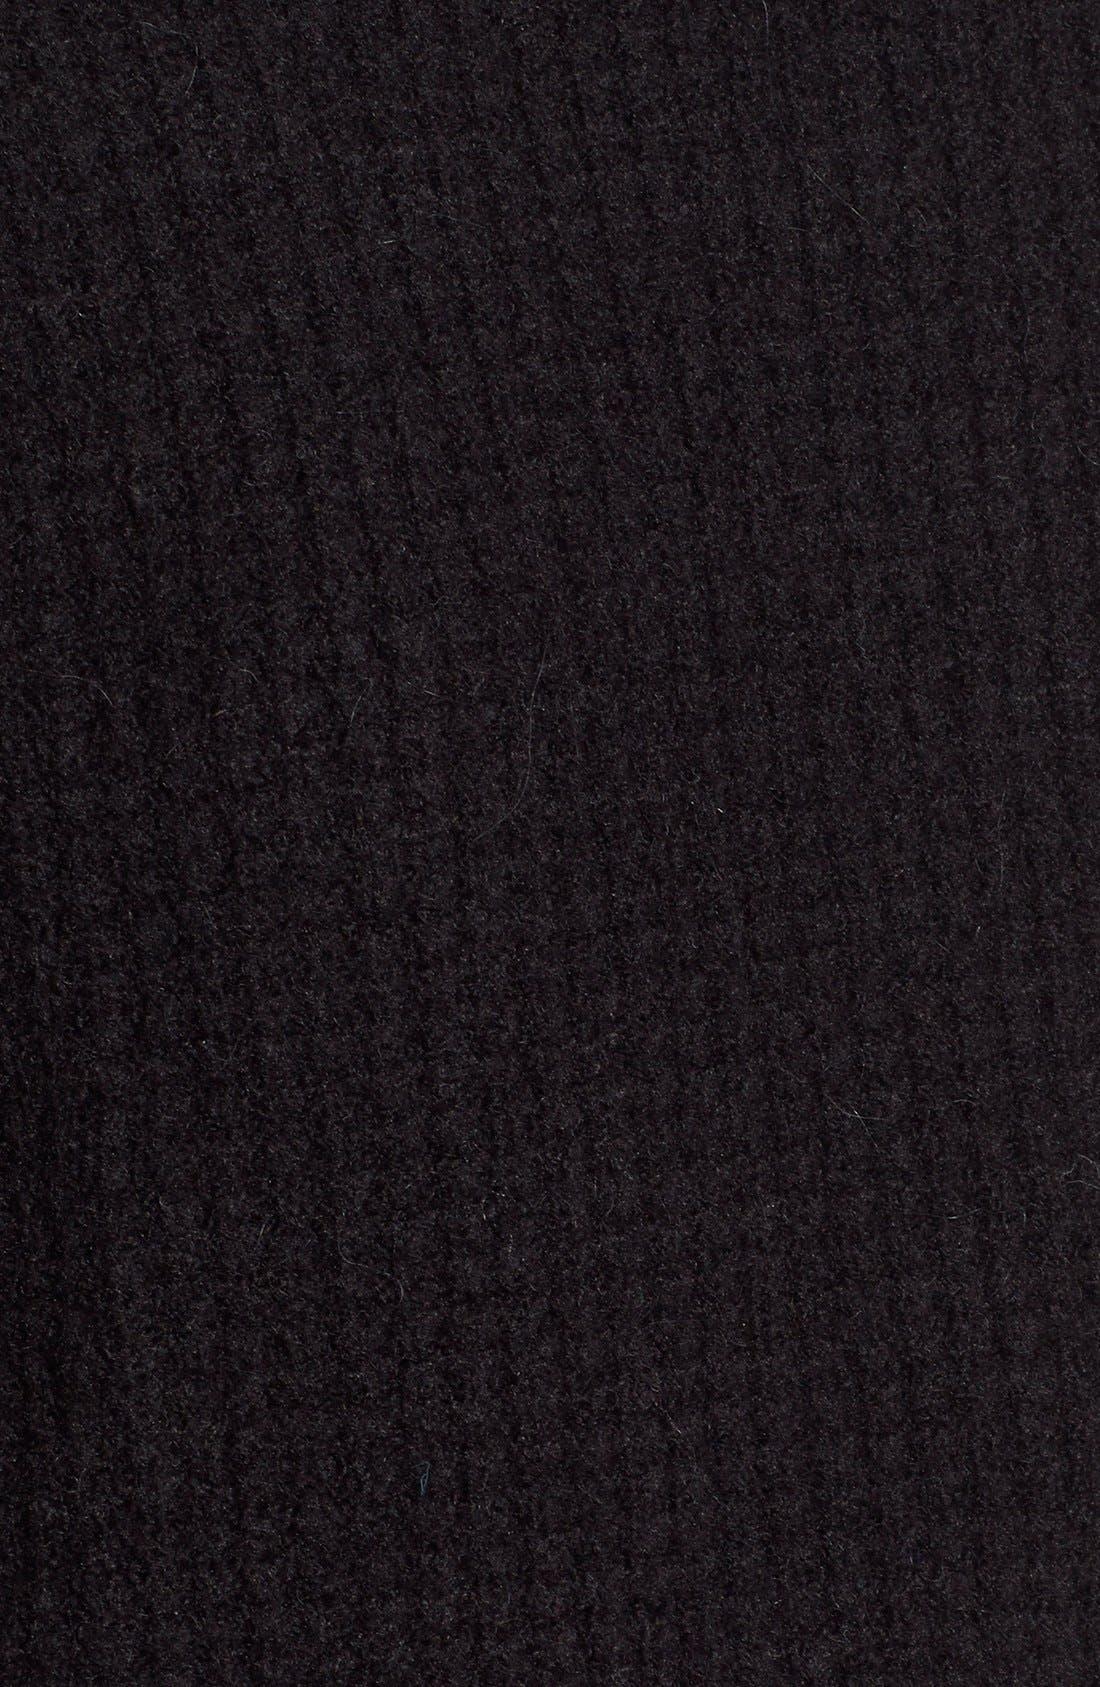 Wafflestitch Turtleneck Sweater,                             Alternate thumbnail 6, color,                             001